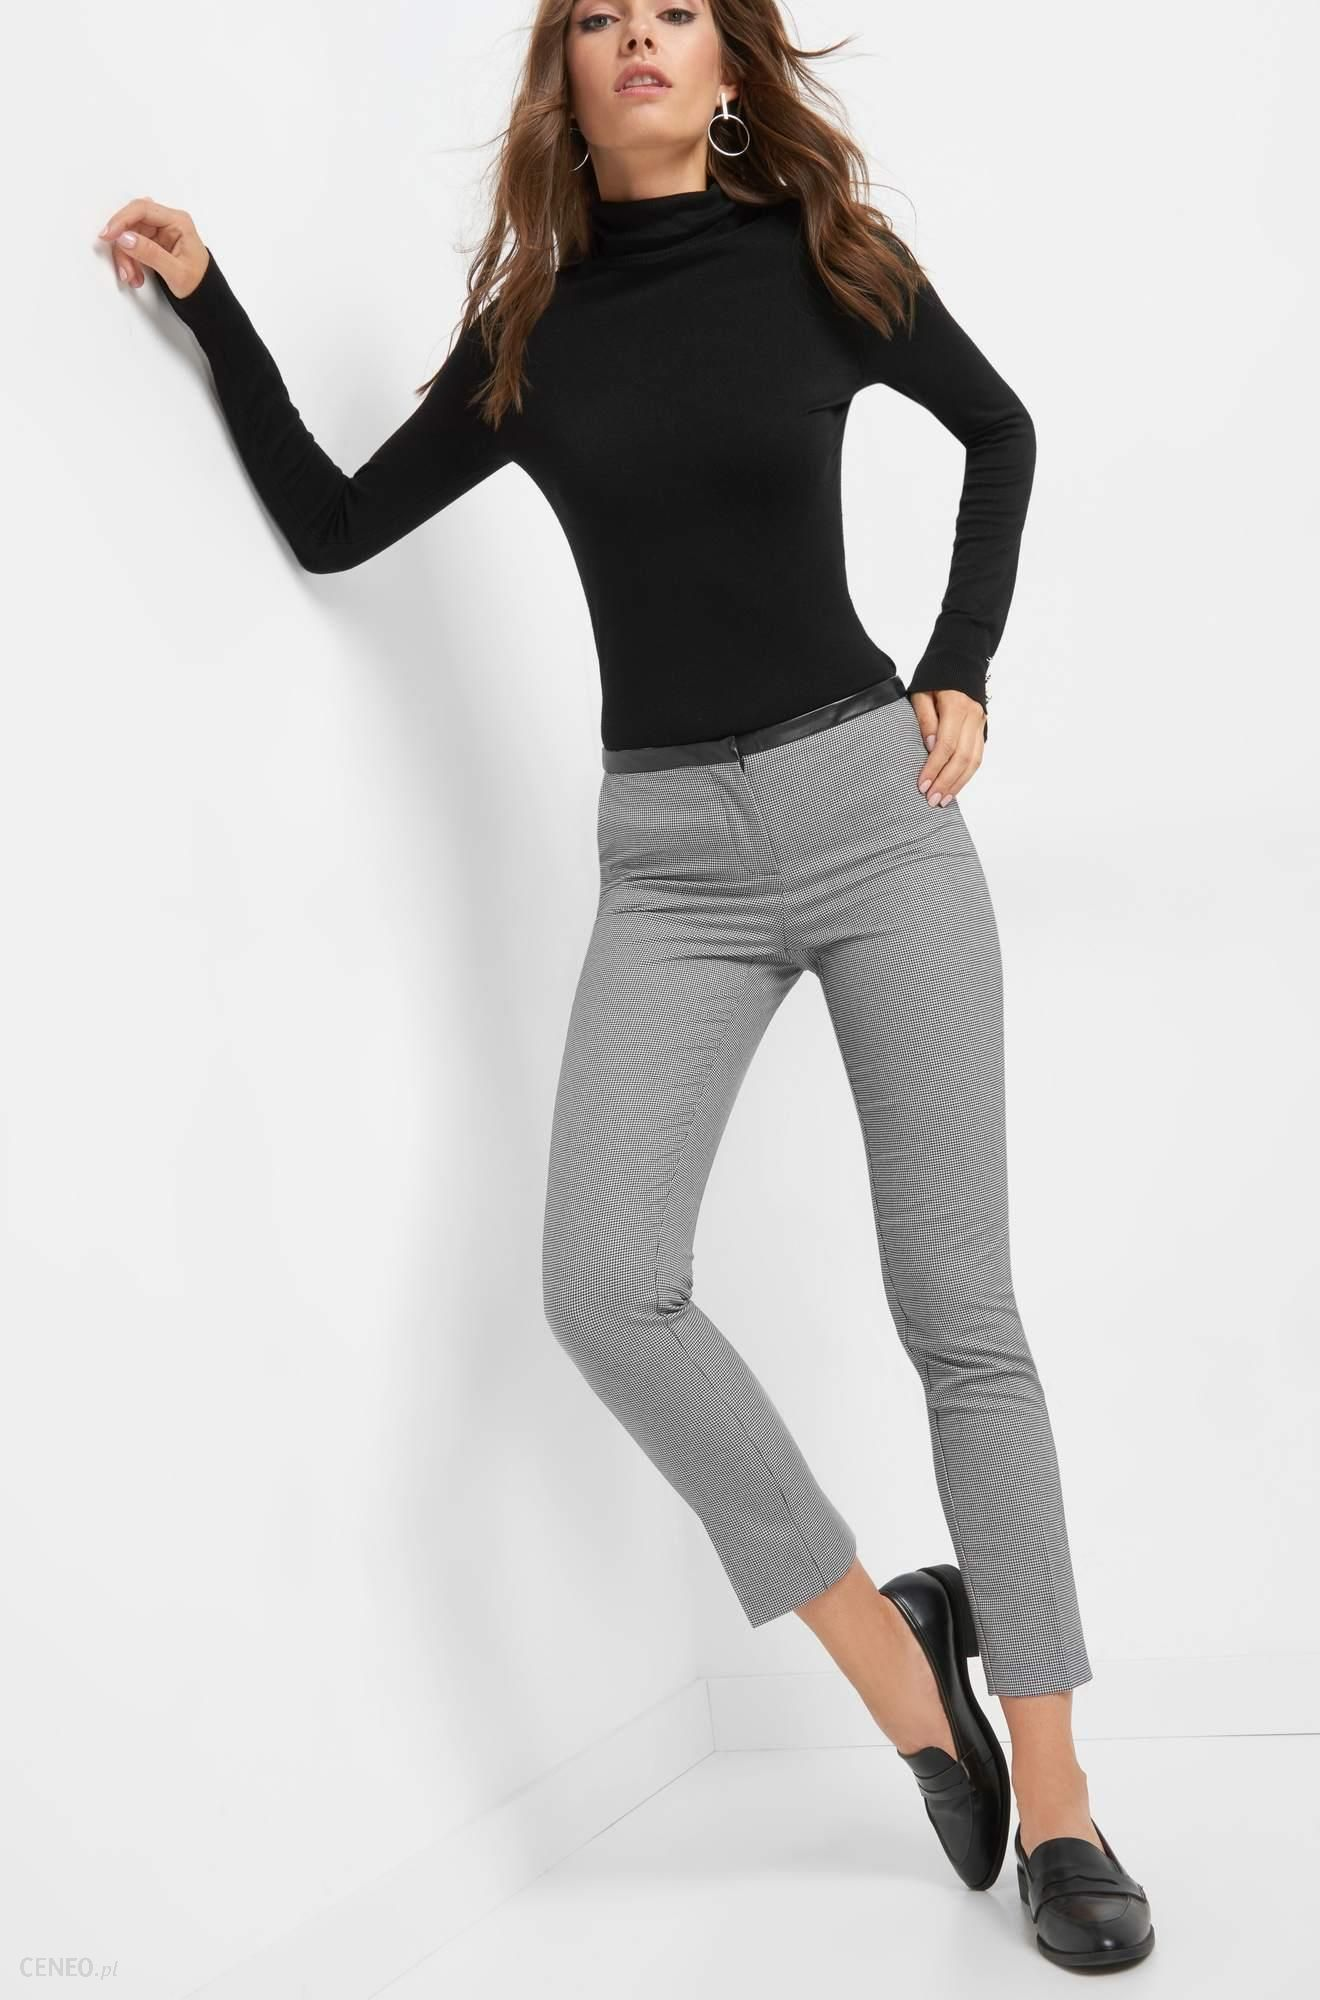 531edad68a63 ... Spodnie damskie Cygaretki Orsay Cygaretki w kant. Orsay Cygaretki w  kant - zdjęcie 1